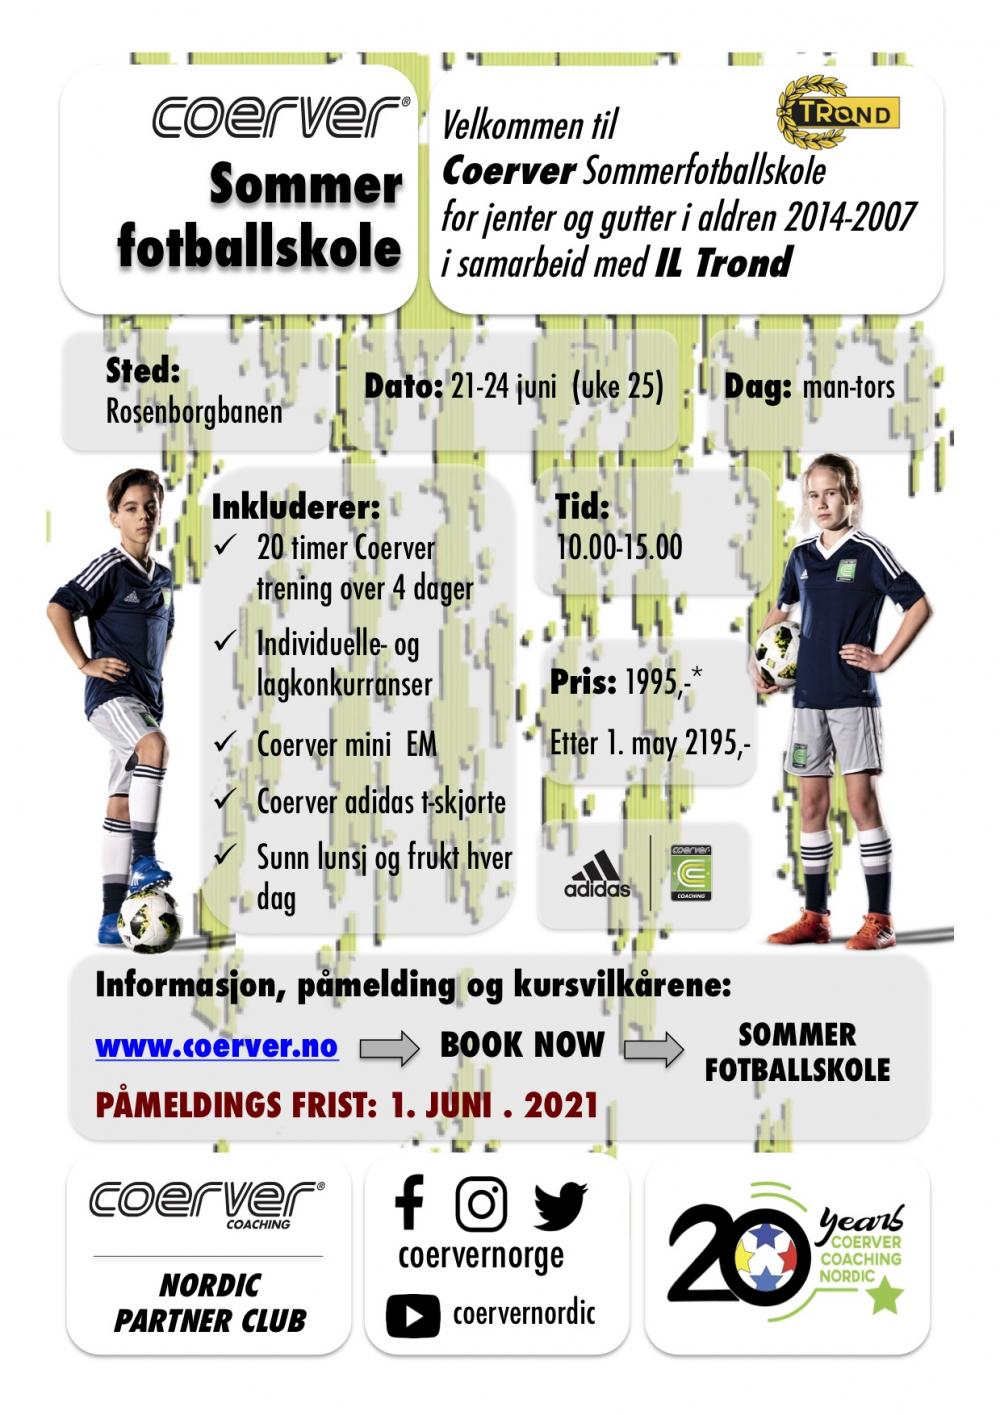 Coerver Sommerfotballskole hos IL Trond 2021 (uke 25)